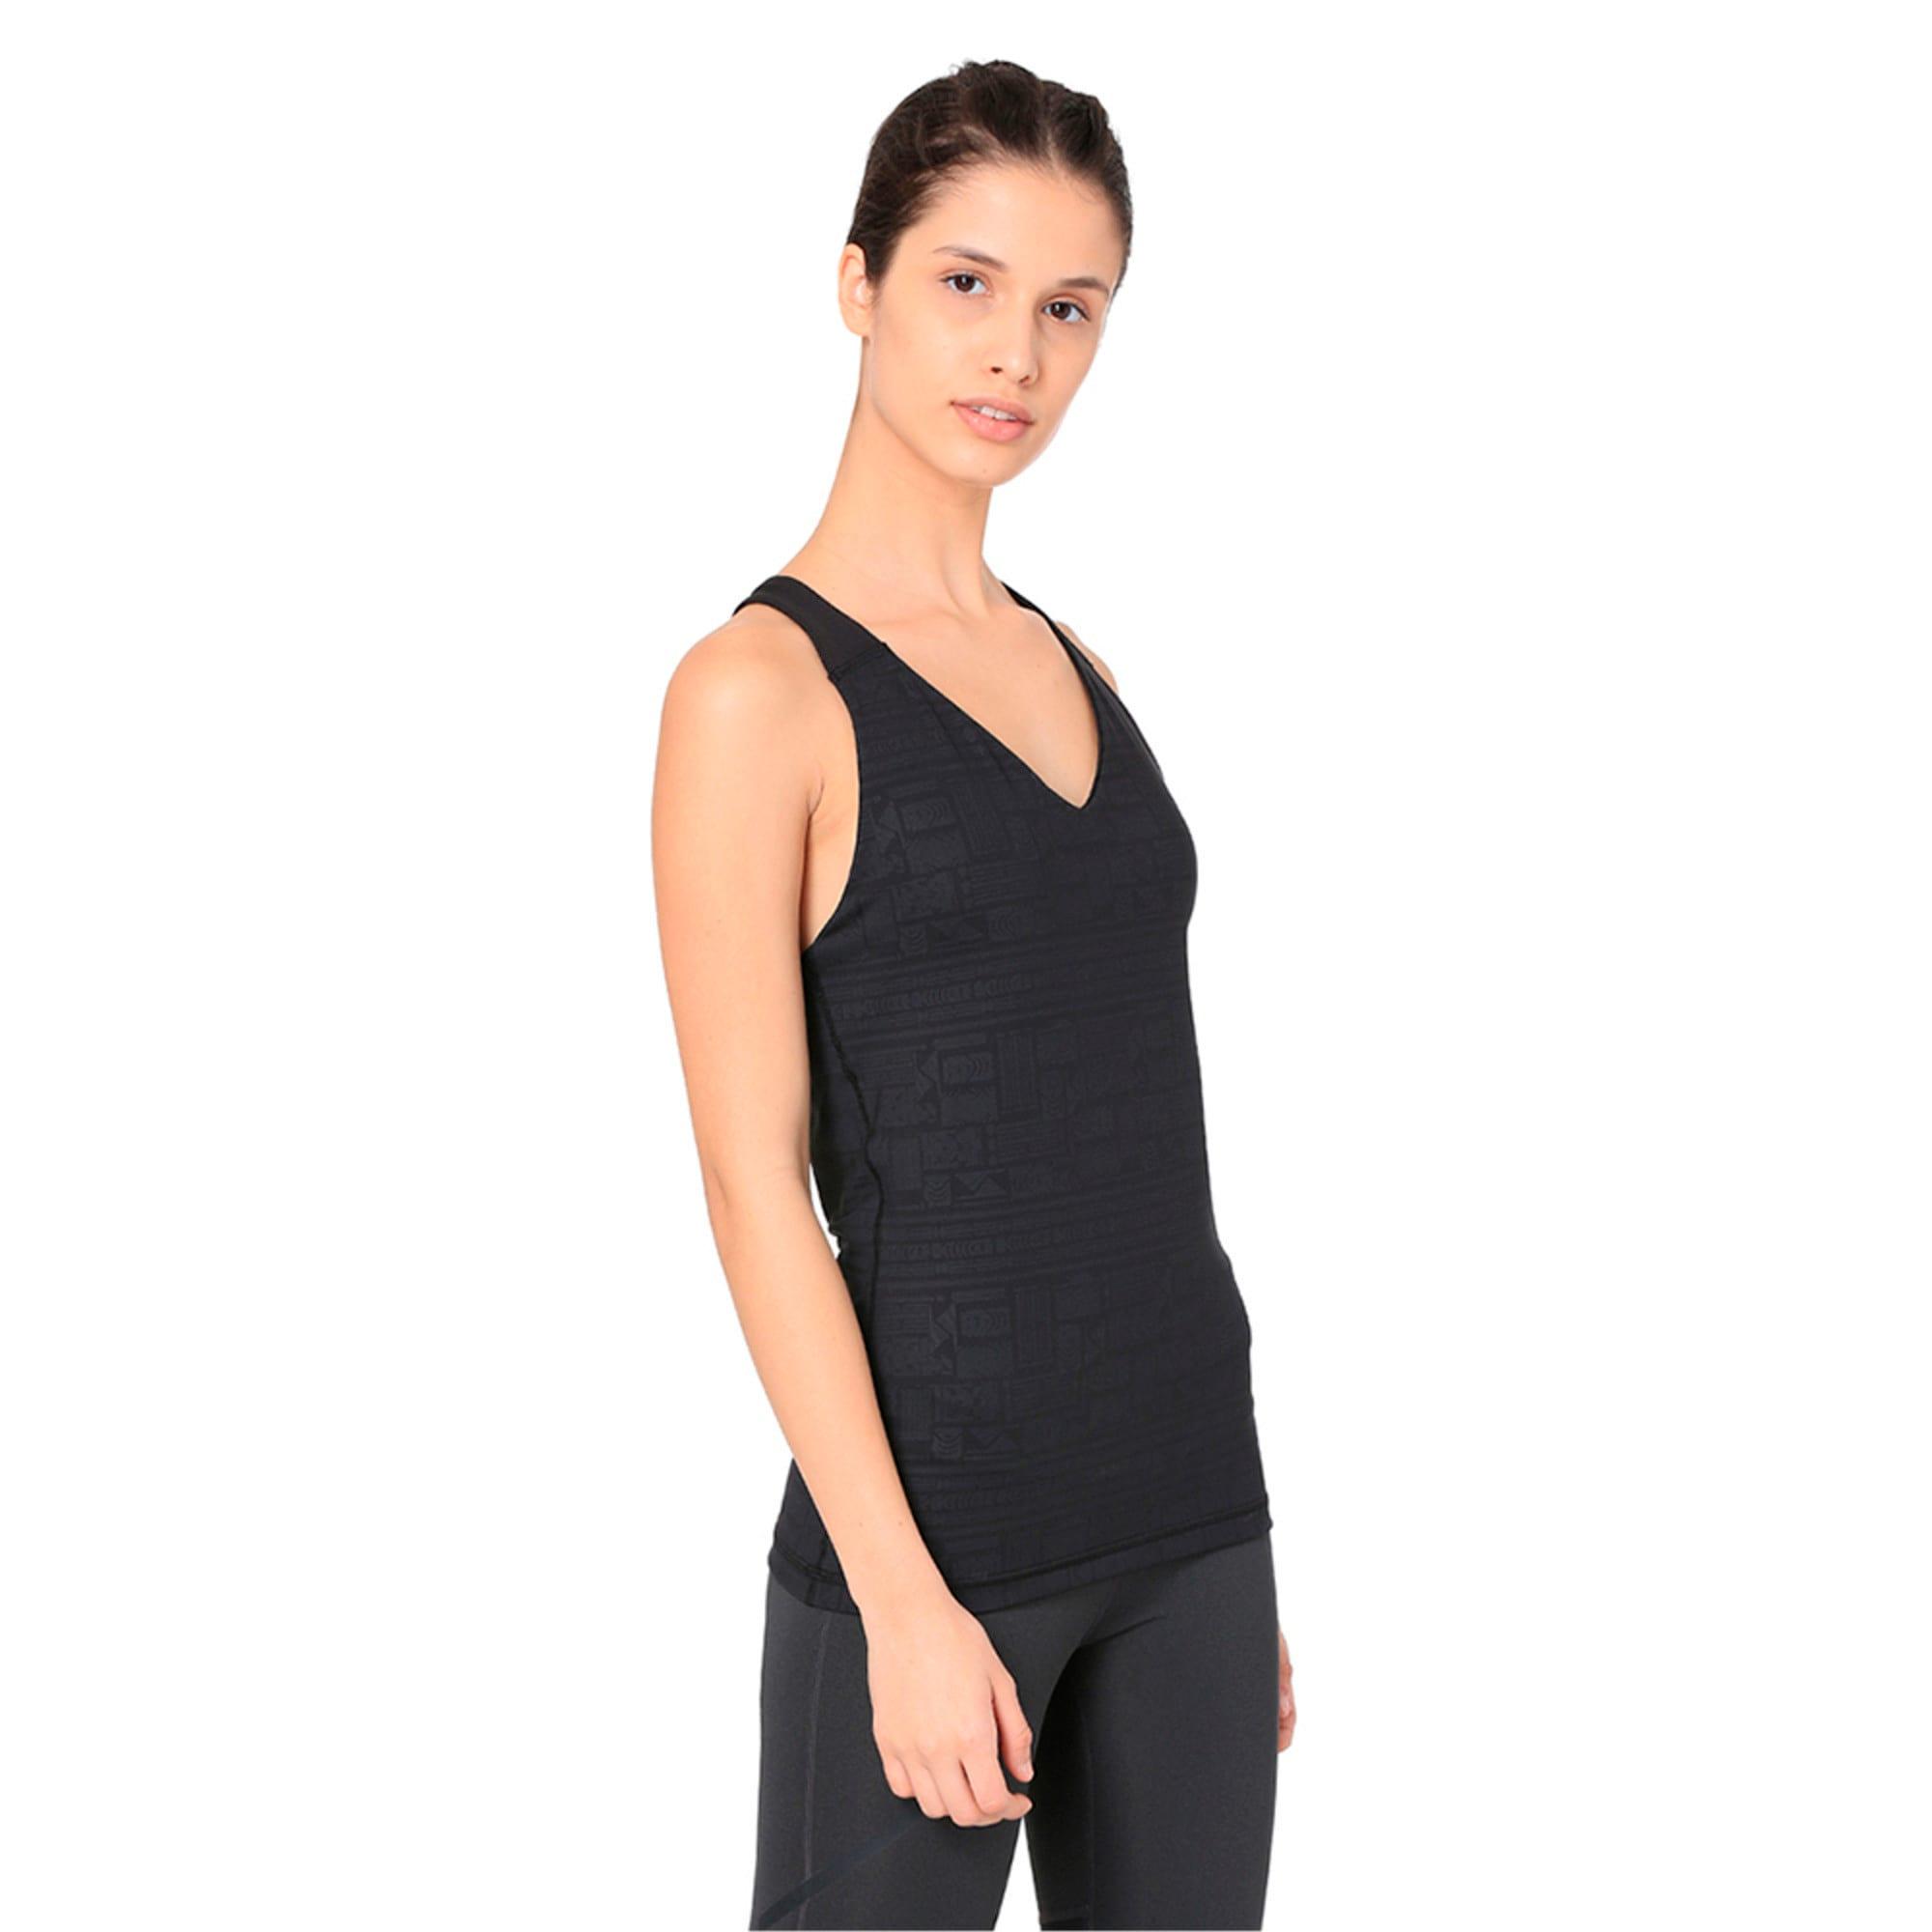 Thumbnail 5 of ALL EYES ON ME Women's Tank Top, Puma Black-Solistice gel prt, medium-IND